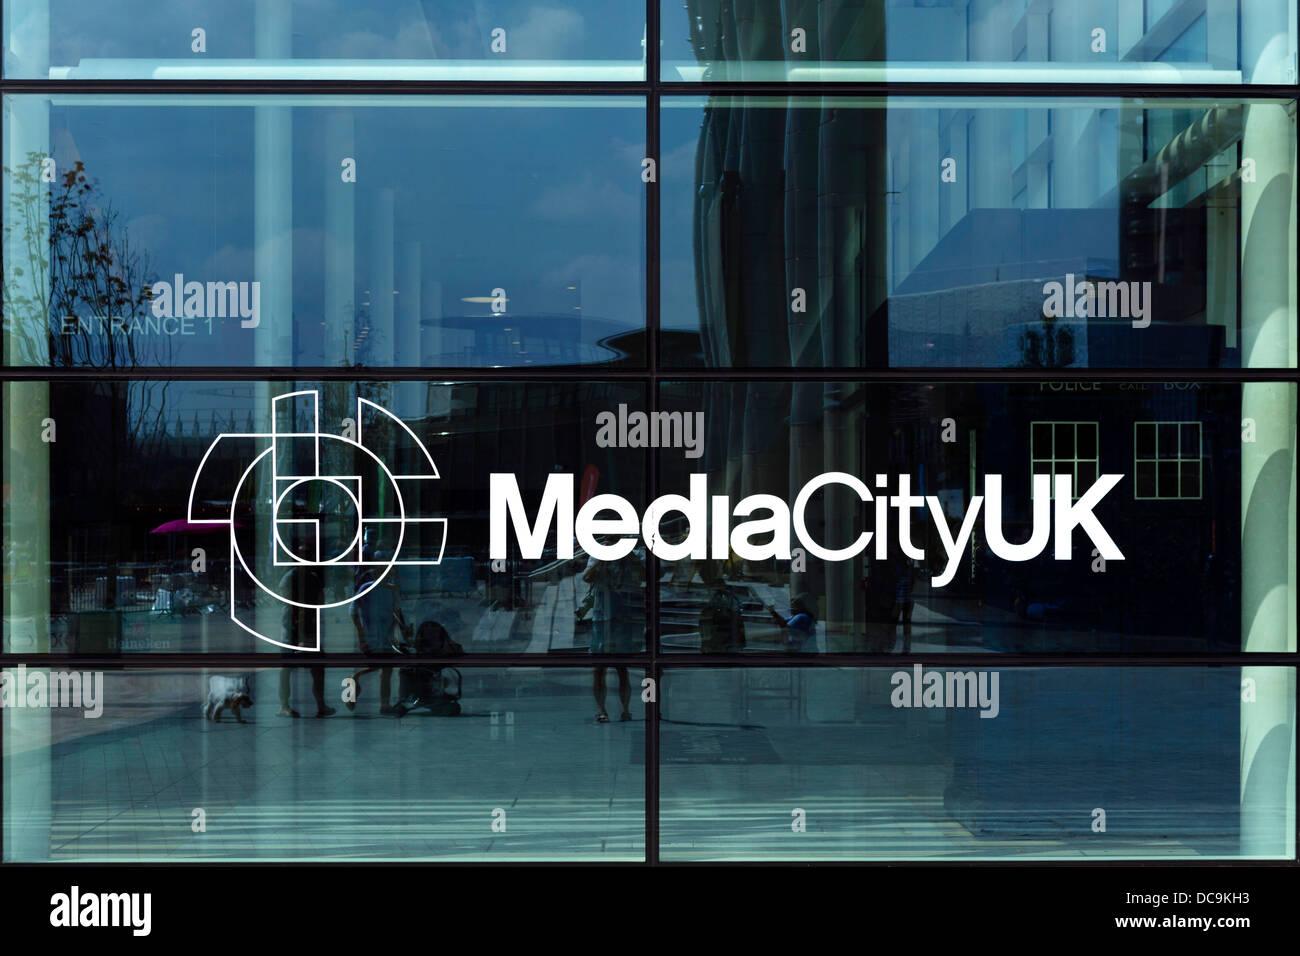 BBC Studios in MediaCityUK, Salford Quays, Manchester, UK - Stock Image